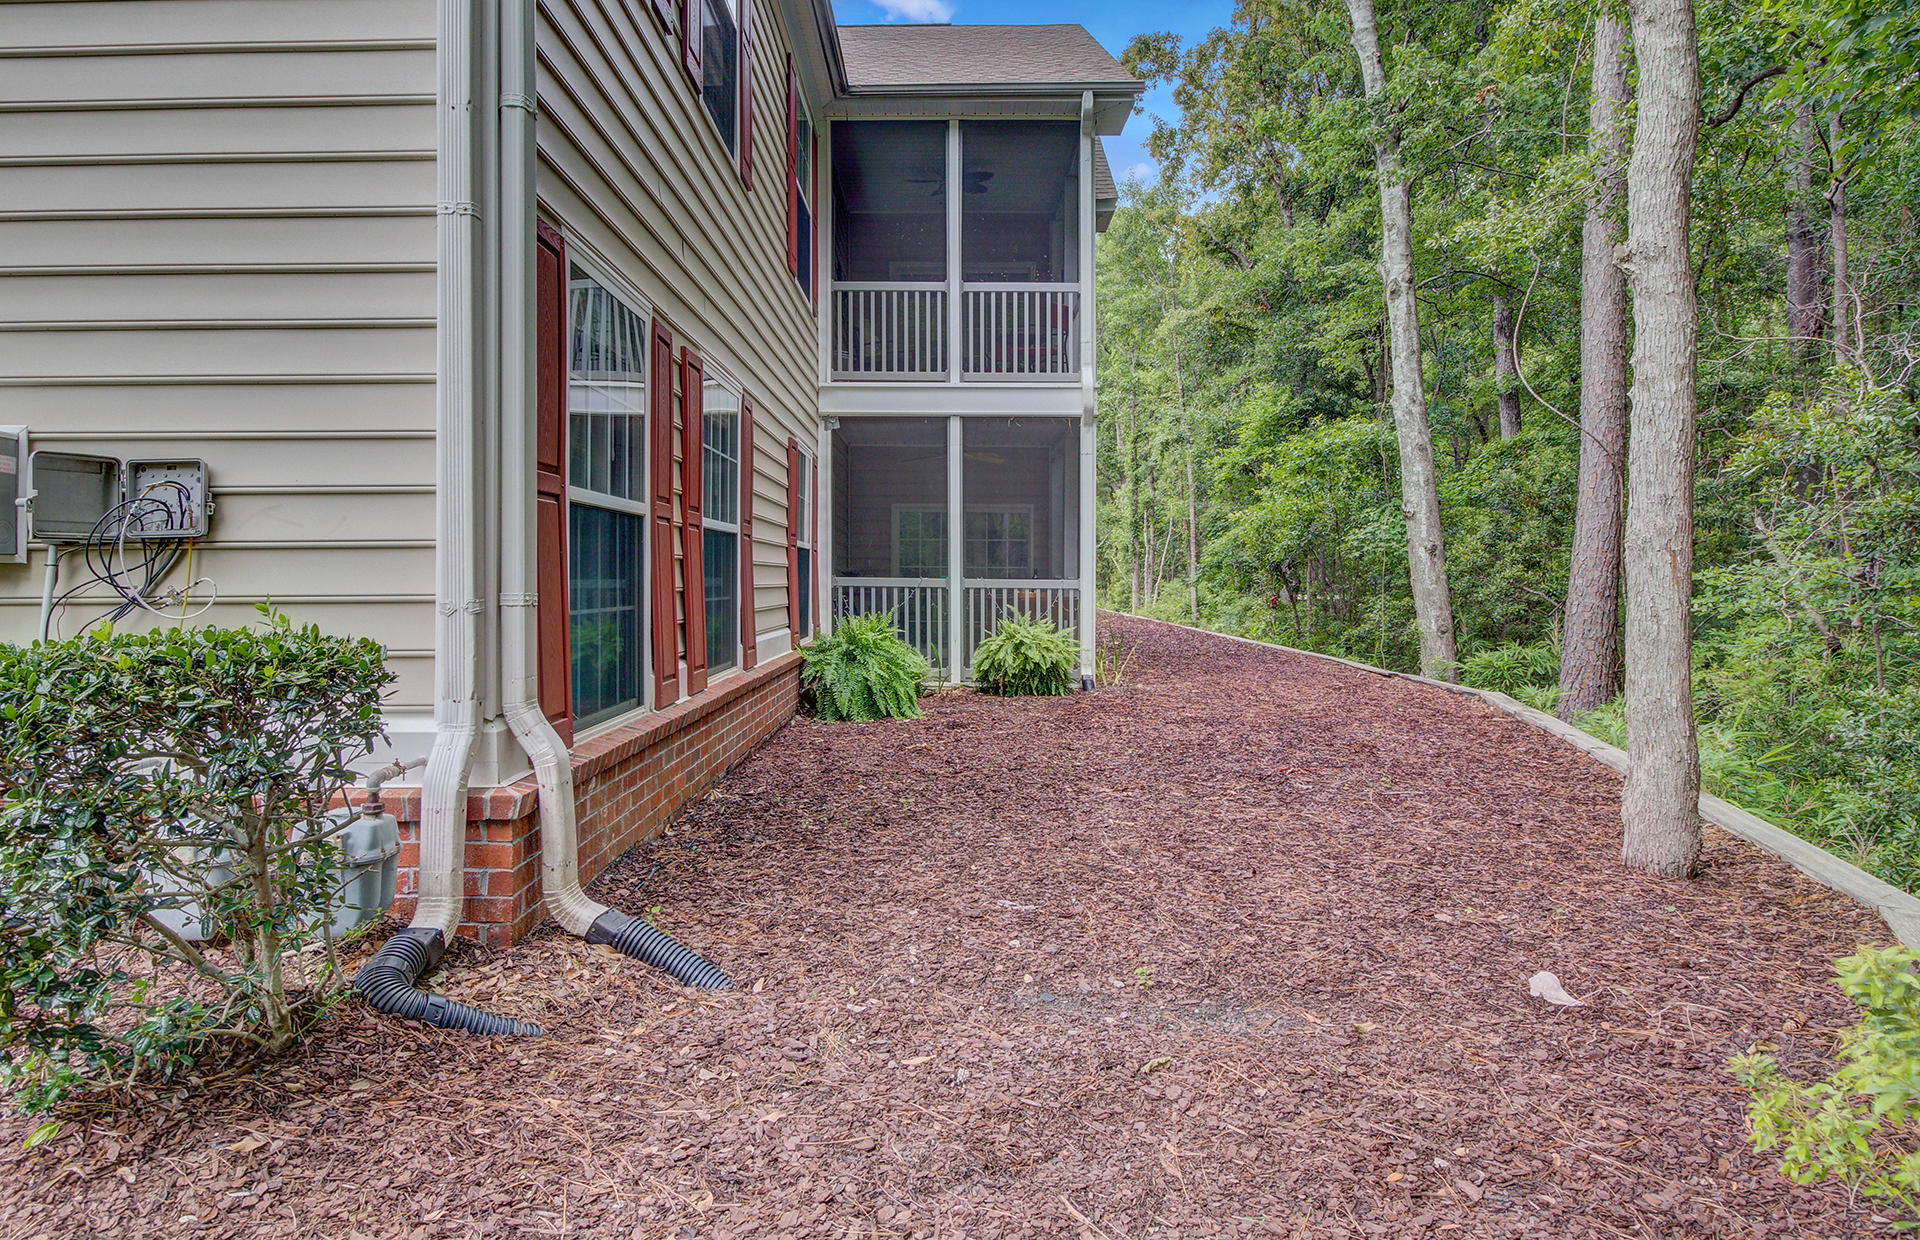 Dunes West Homes For Sale - 1566 Oxborough, Mount Pleasant, SC - 9